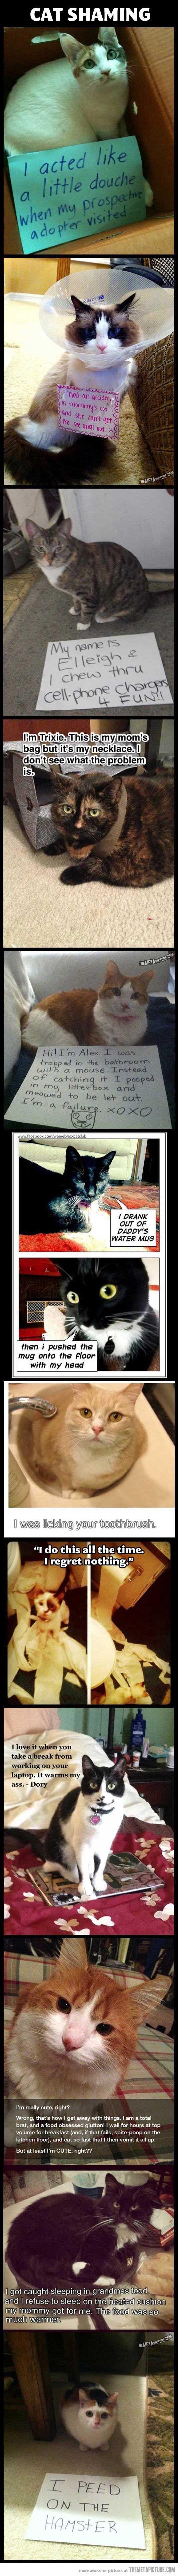 Cat shaming.